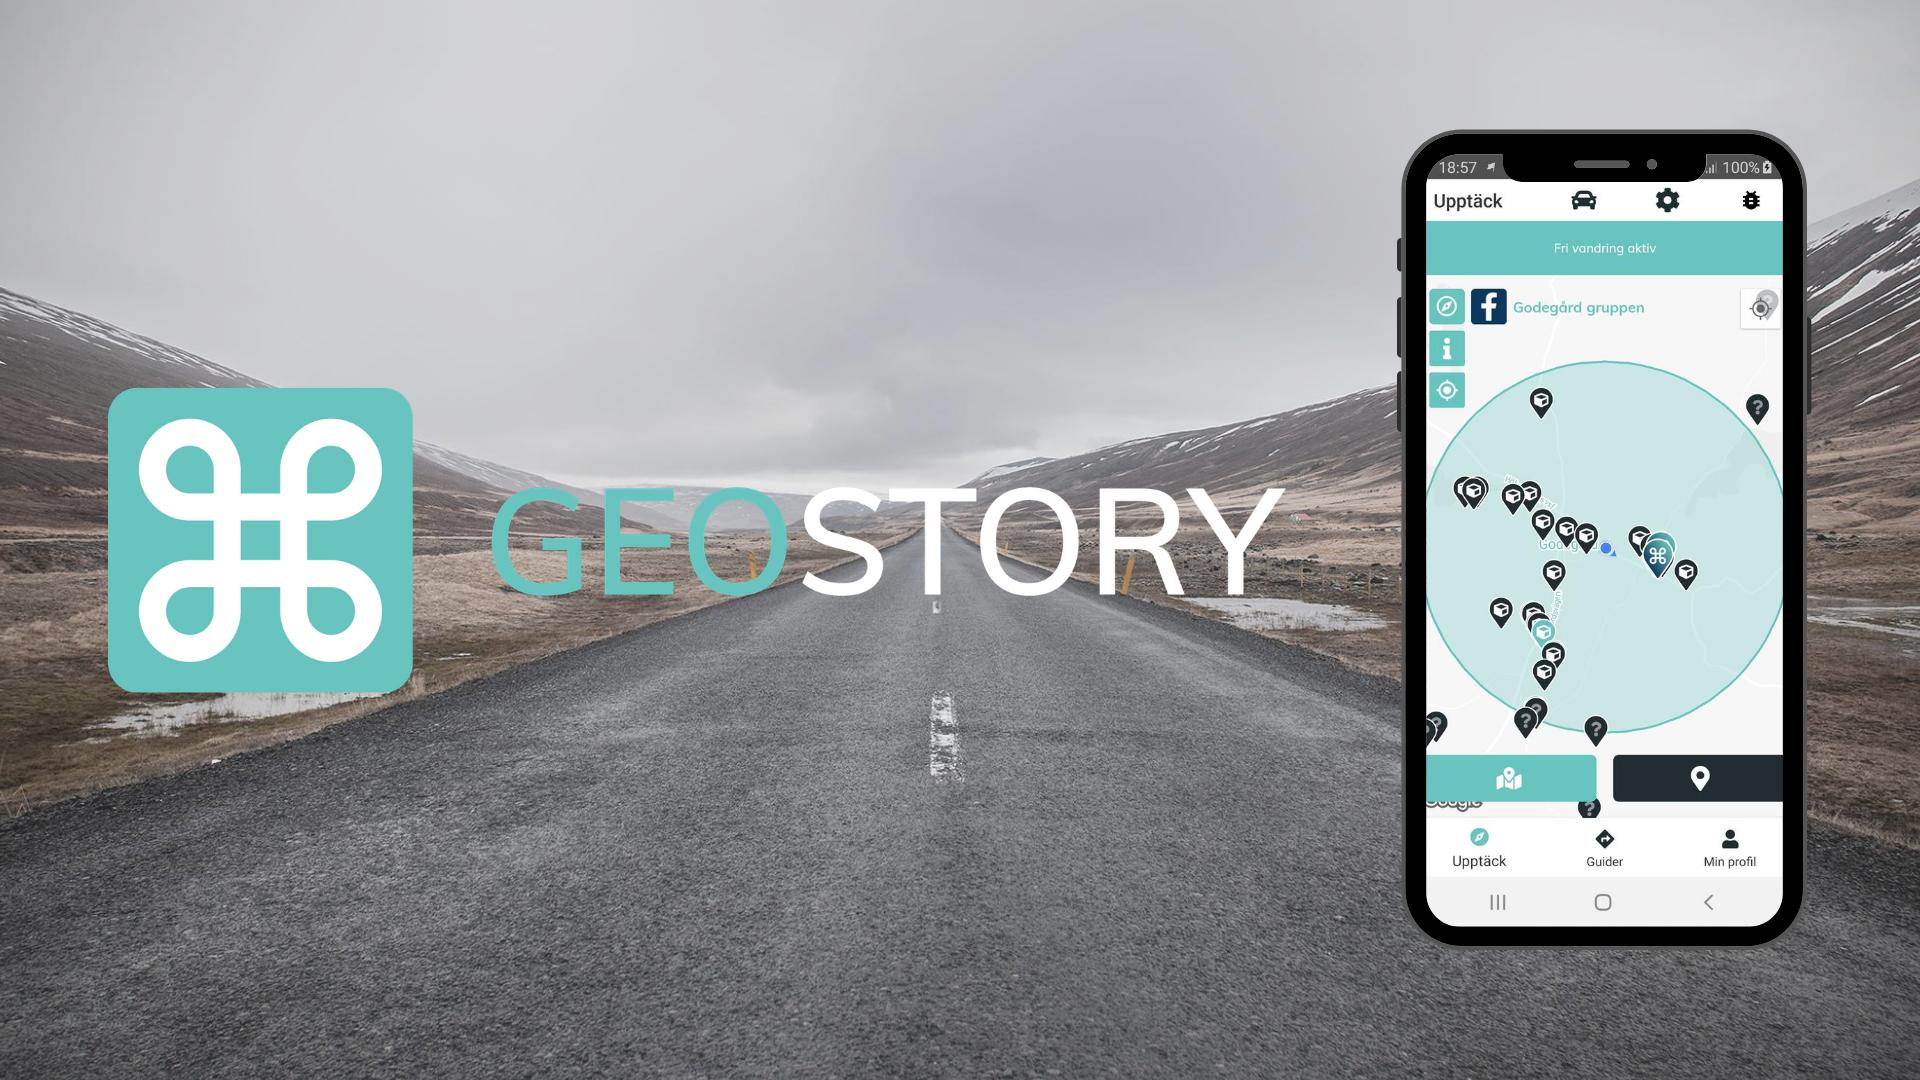 Hur fungerar GeoStory?